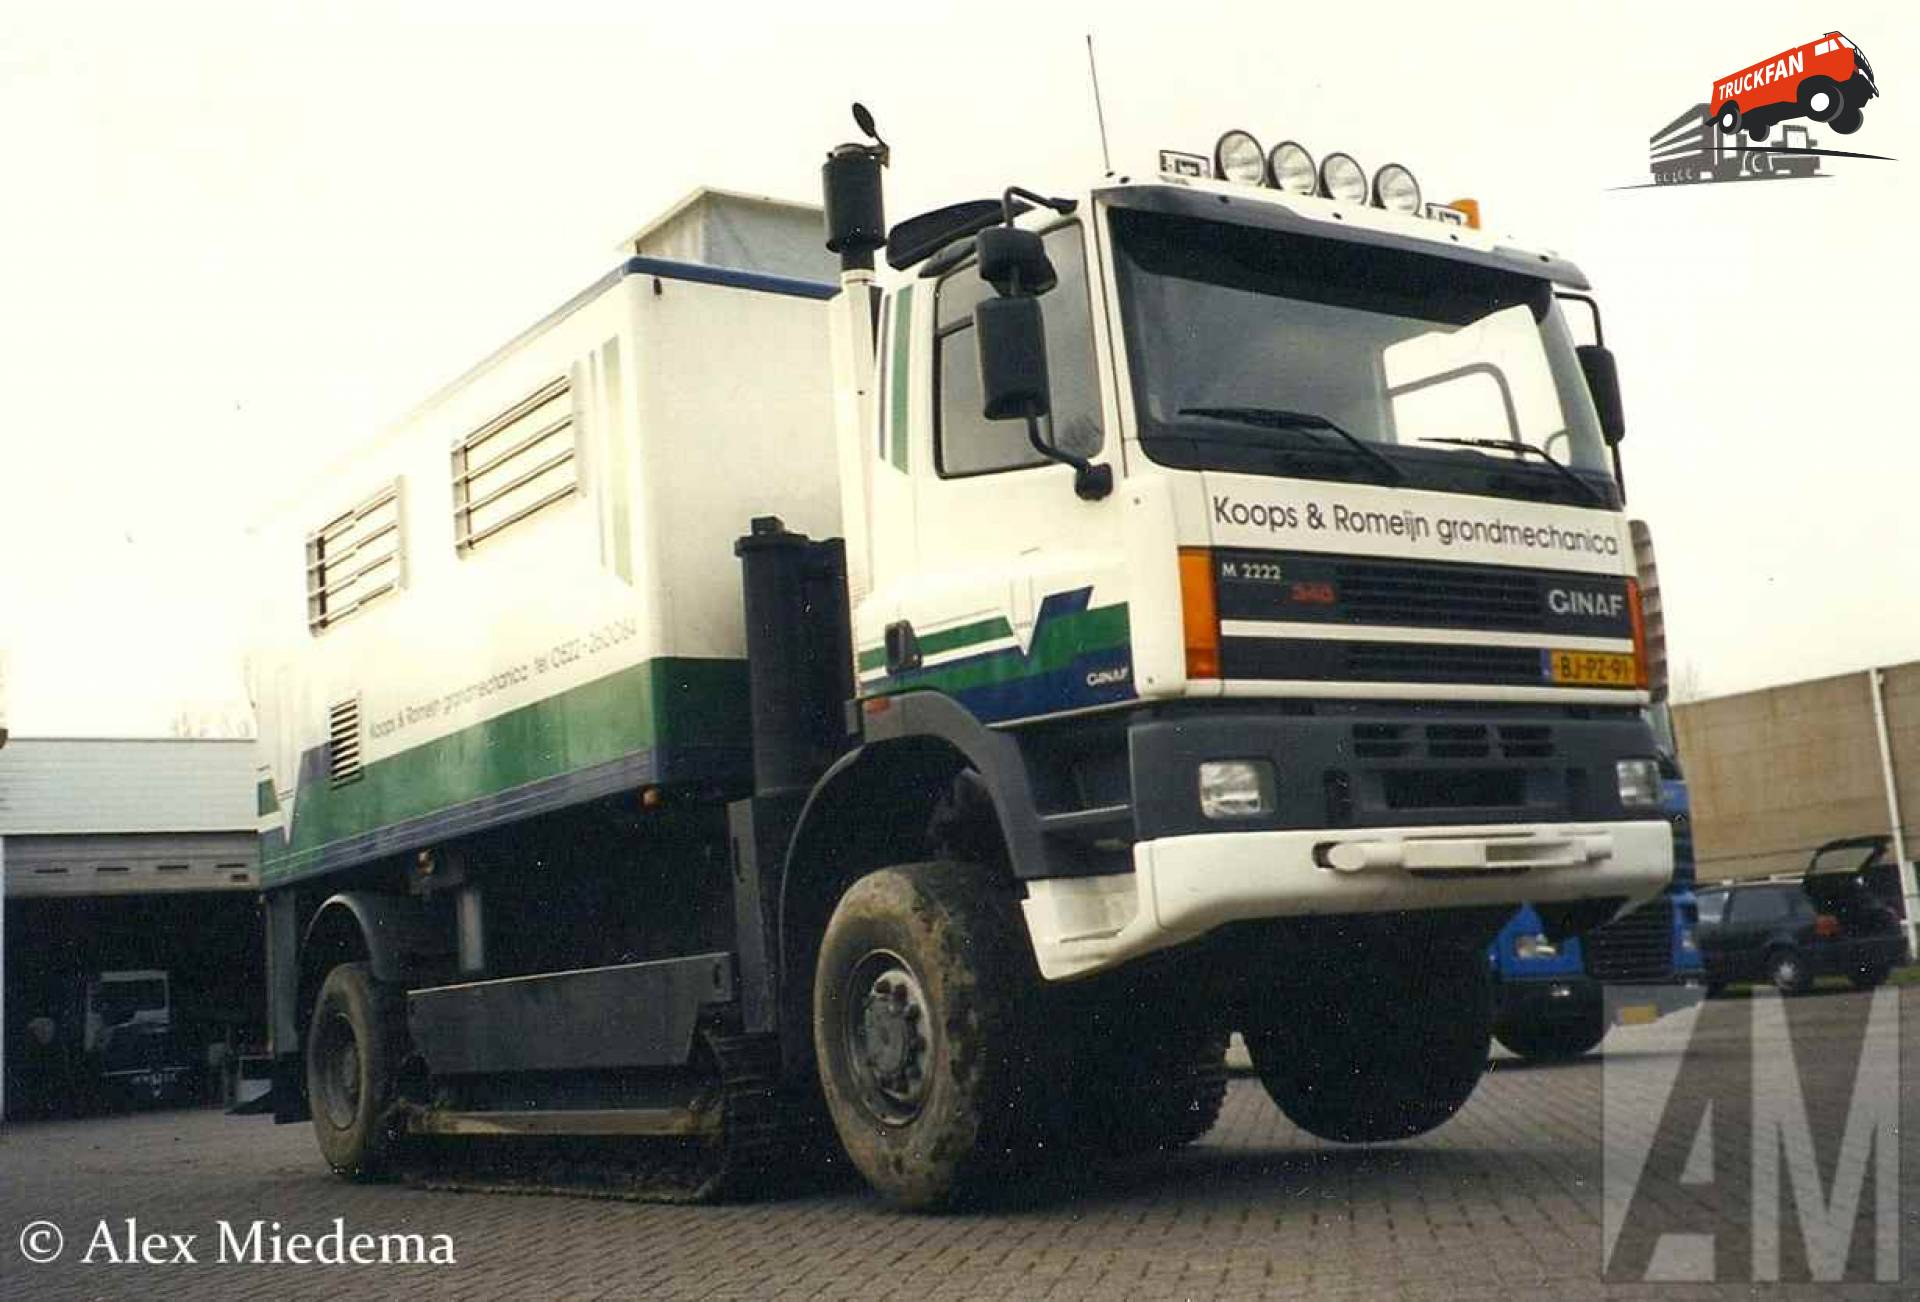 GINAF M2222